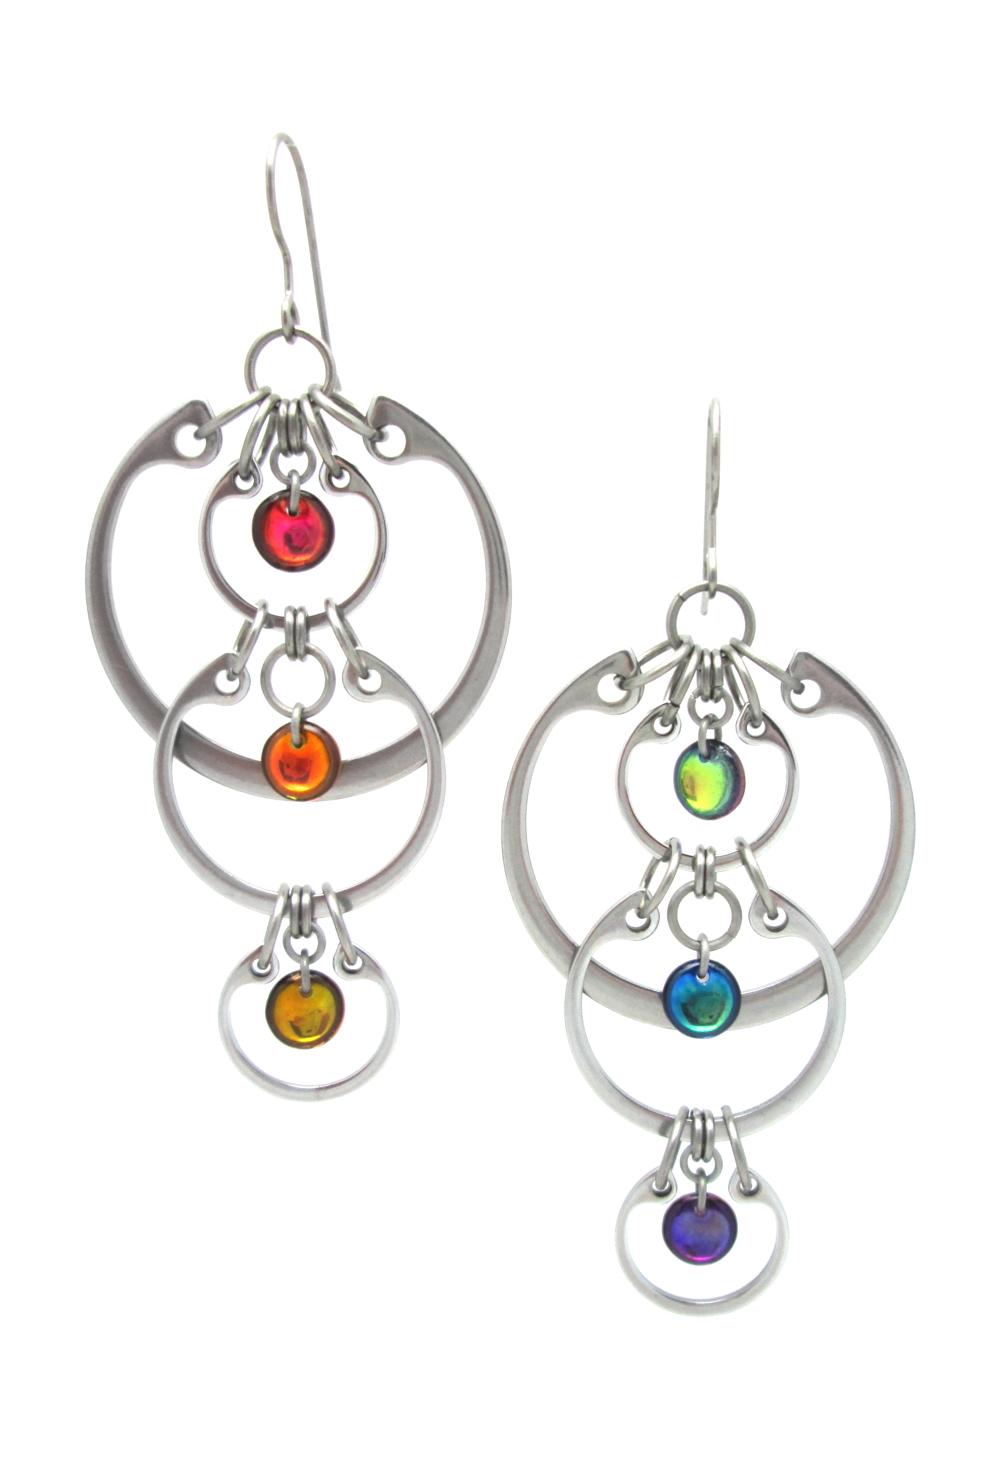 Photo of Wraptillion's modern linked circle Cascading Rainbow Earrings on a white background.